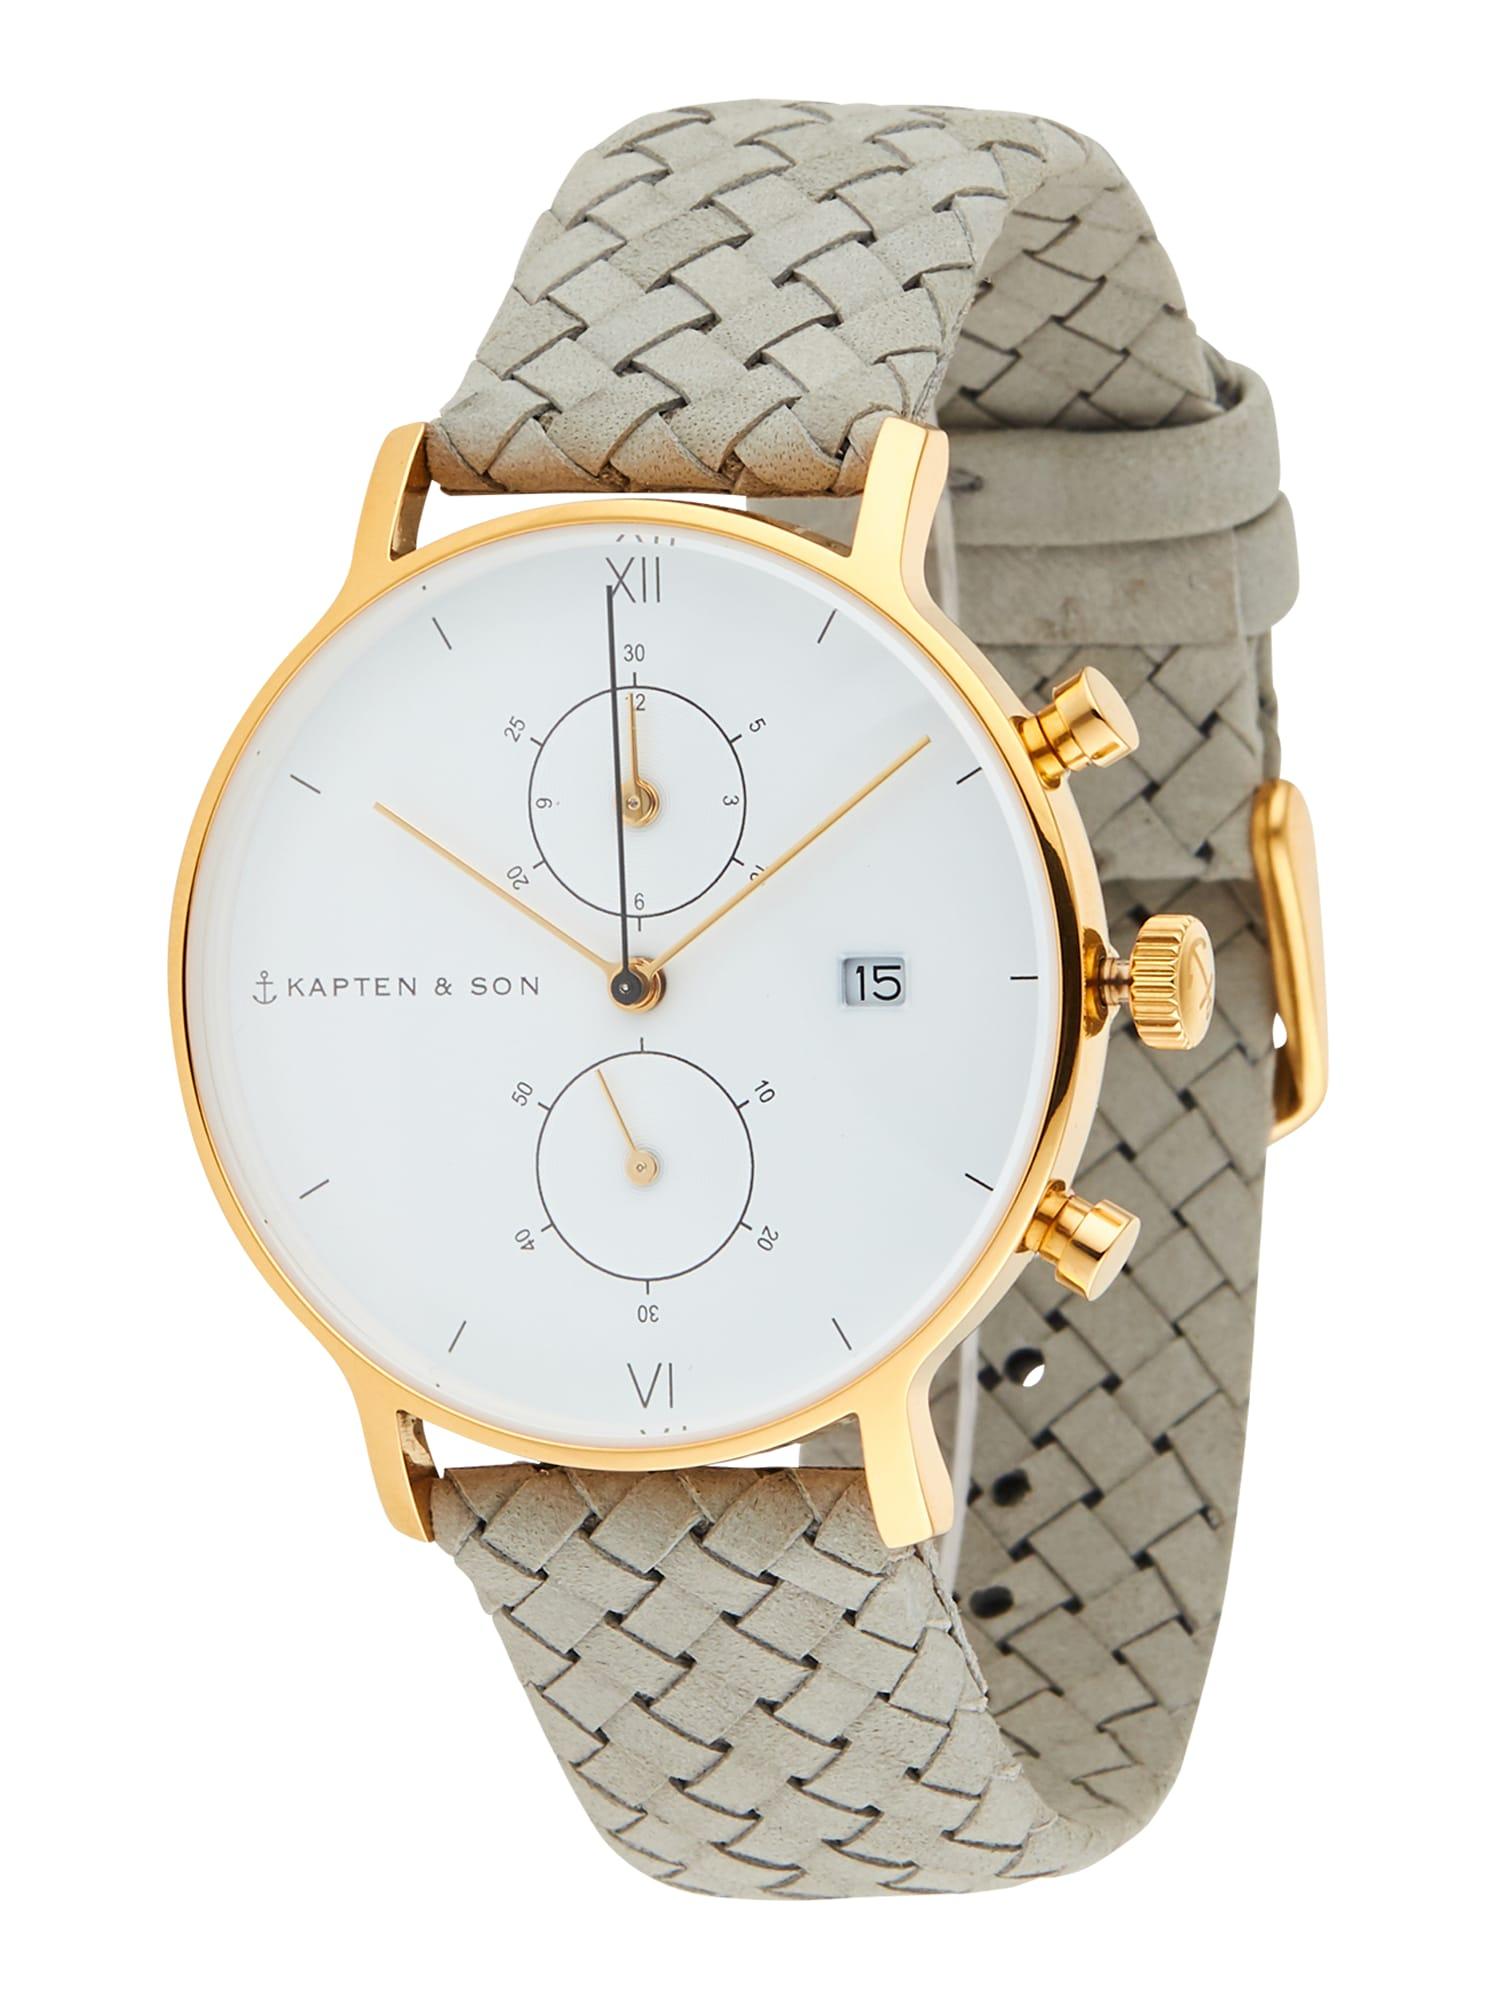 Kapten & Son Analoginis (įprasto dizaino) laikrodis pilka